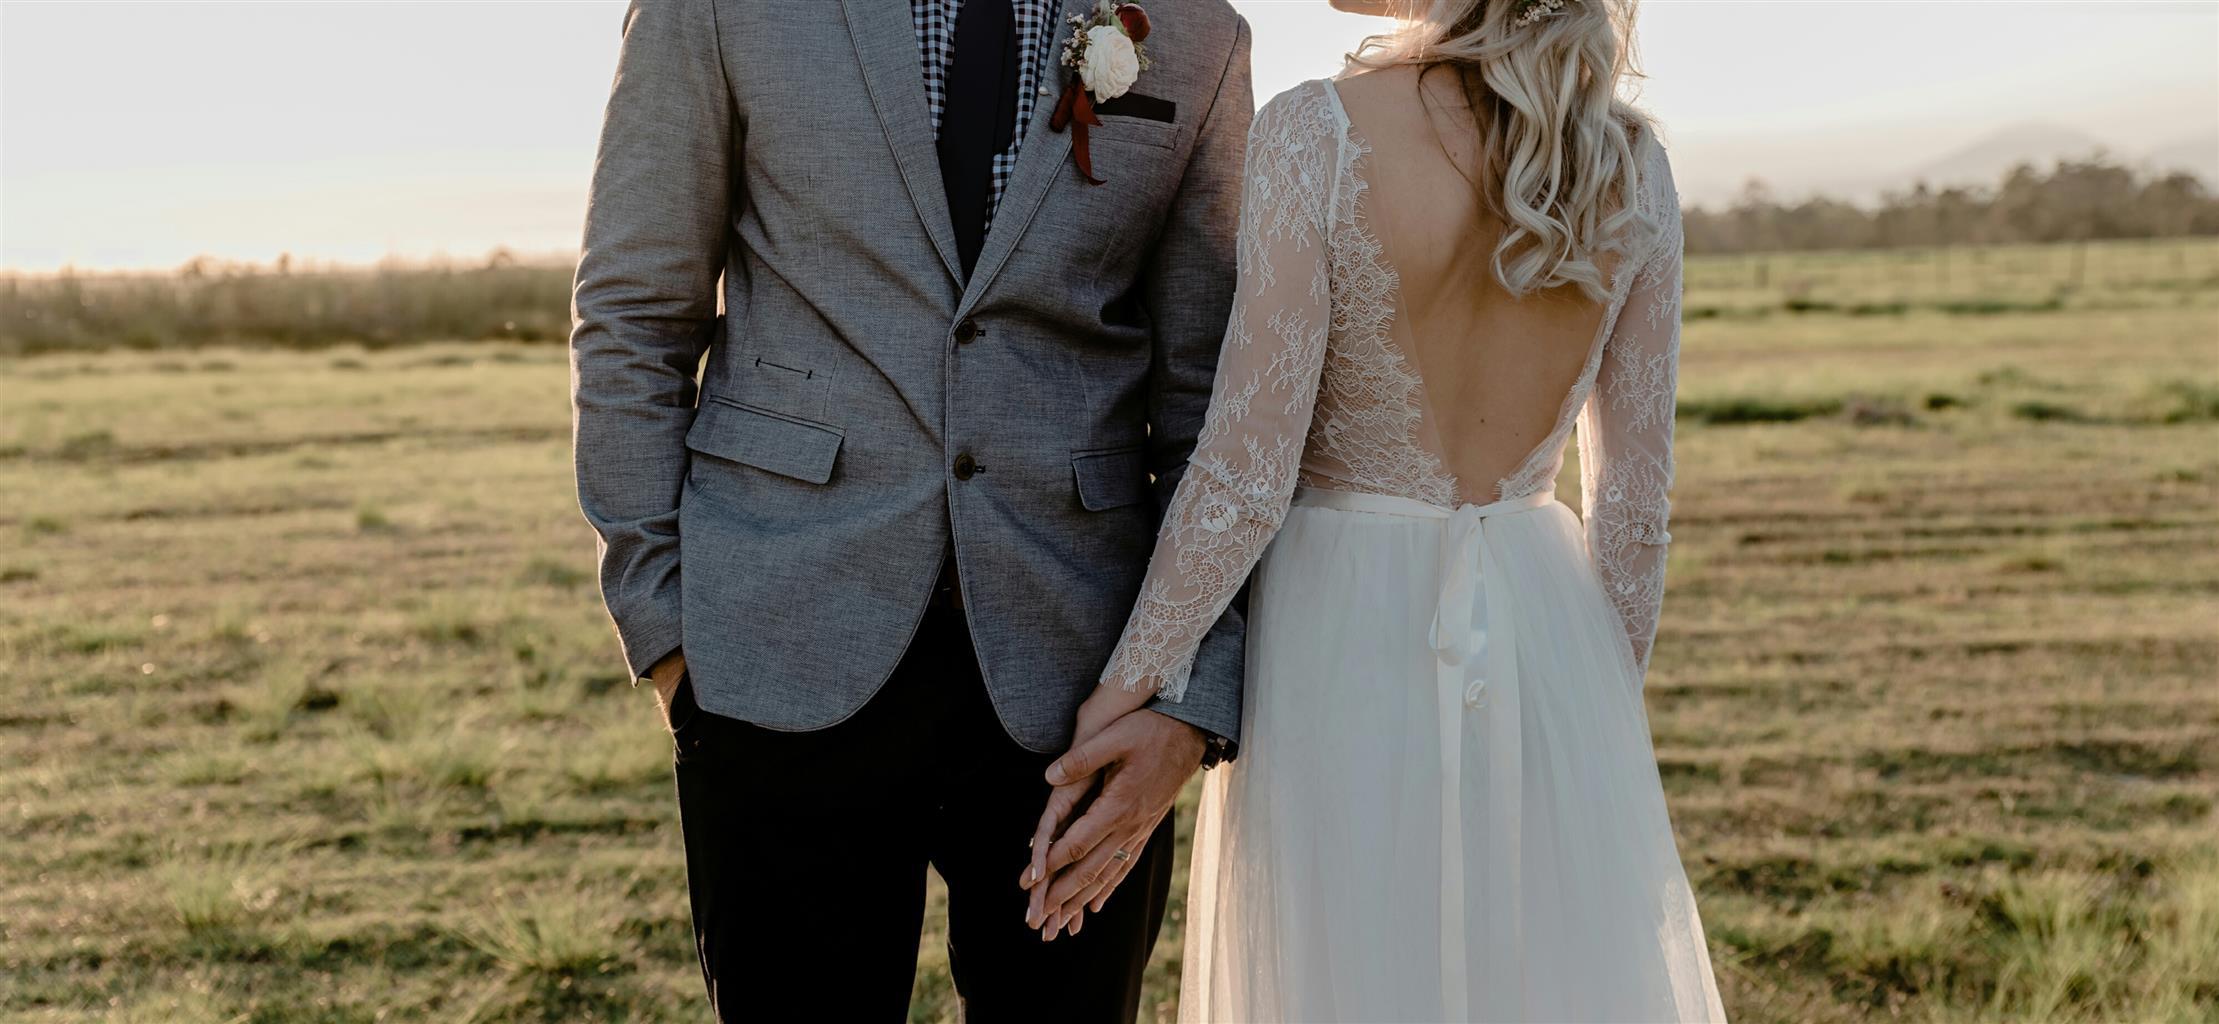 Bohemian Wedding Dress For Sale